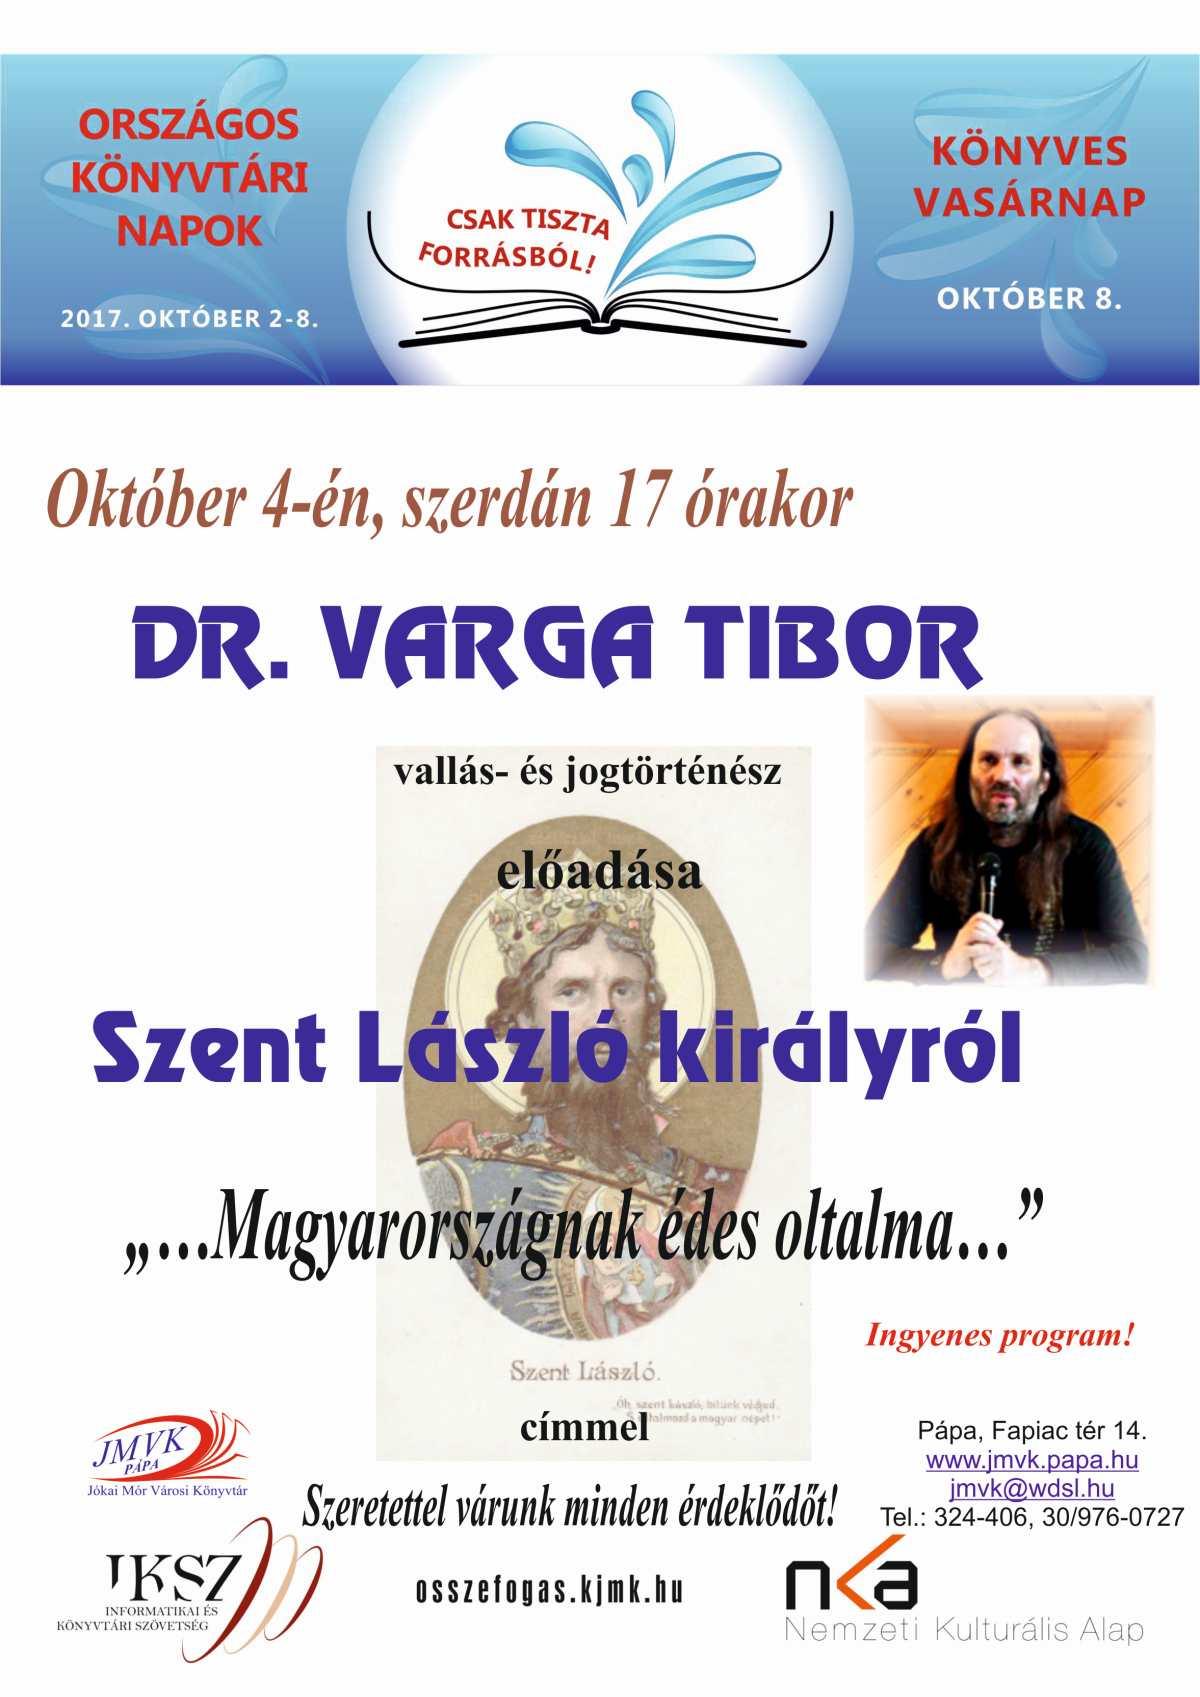 plakt_-varga_tibor.jpg